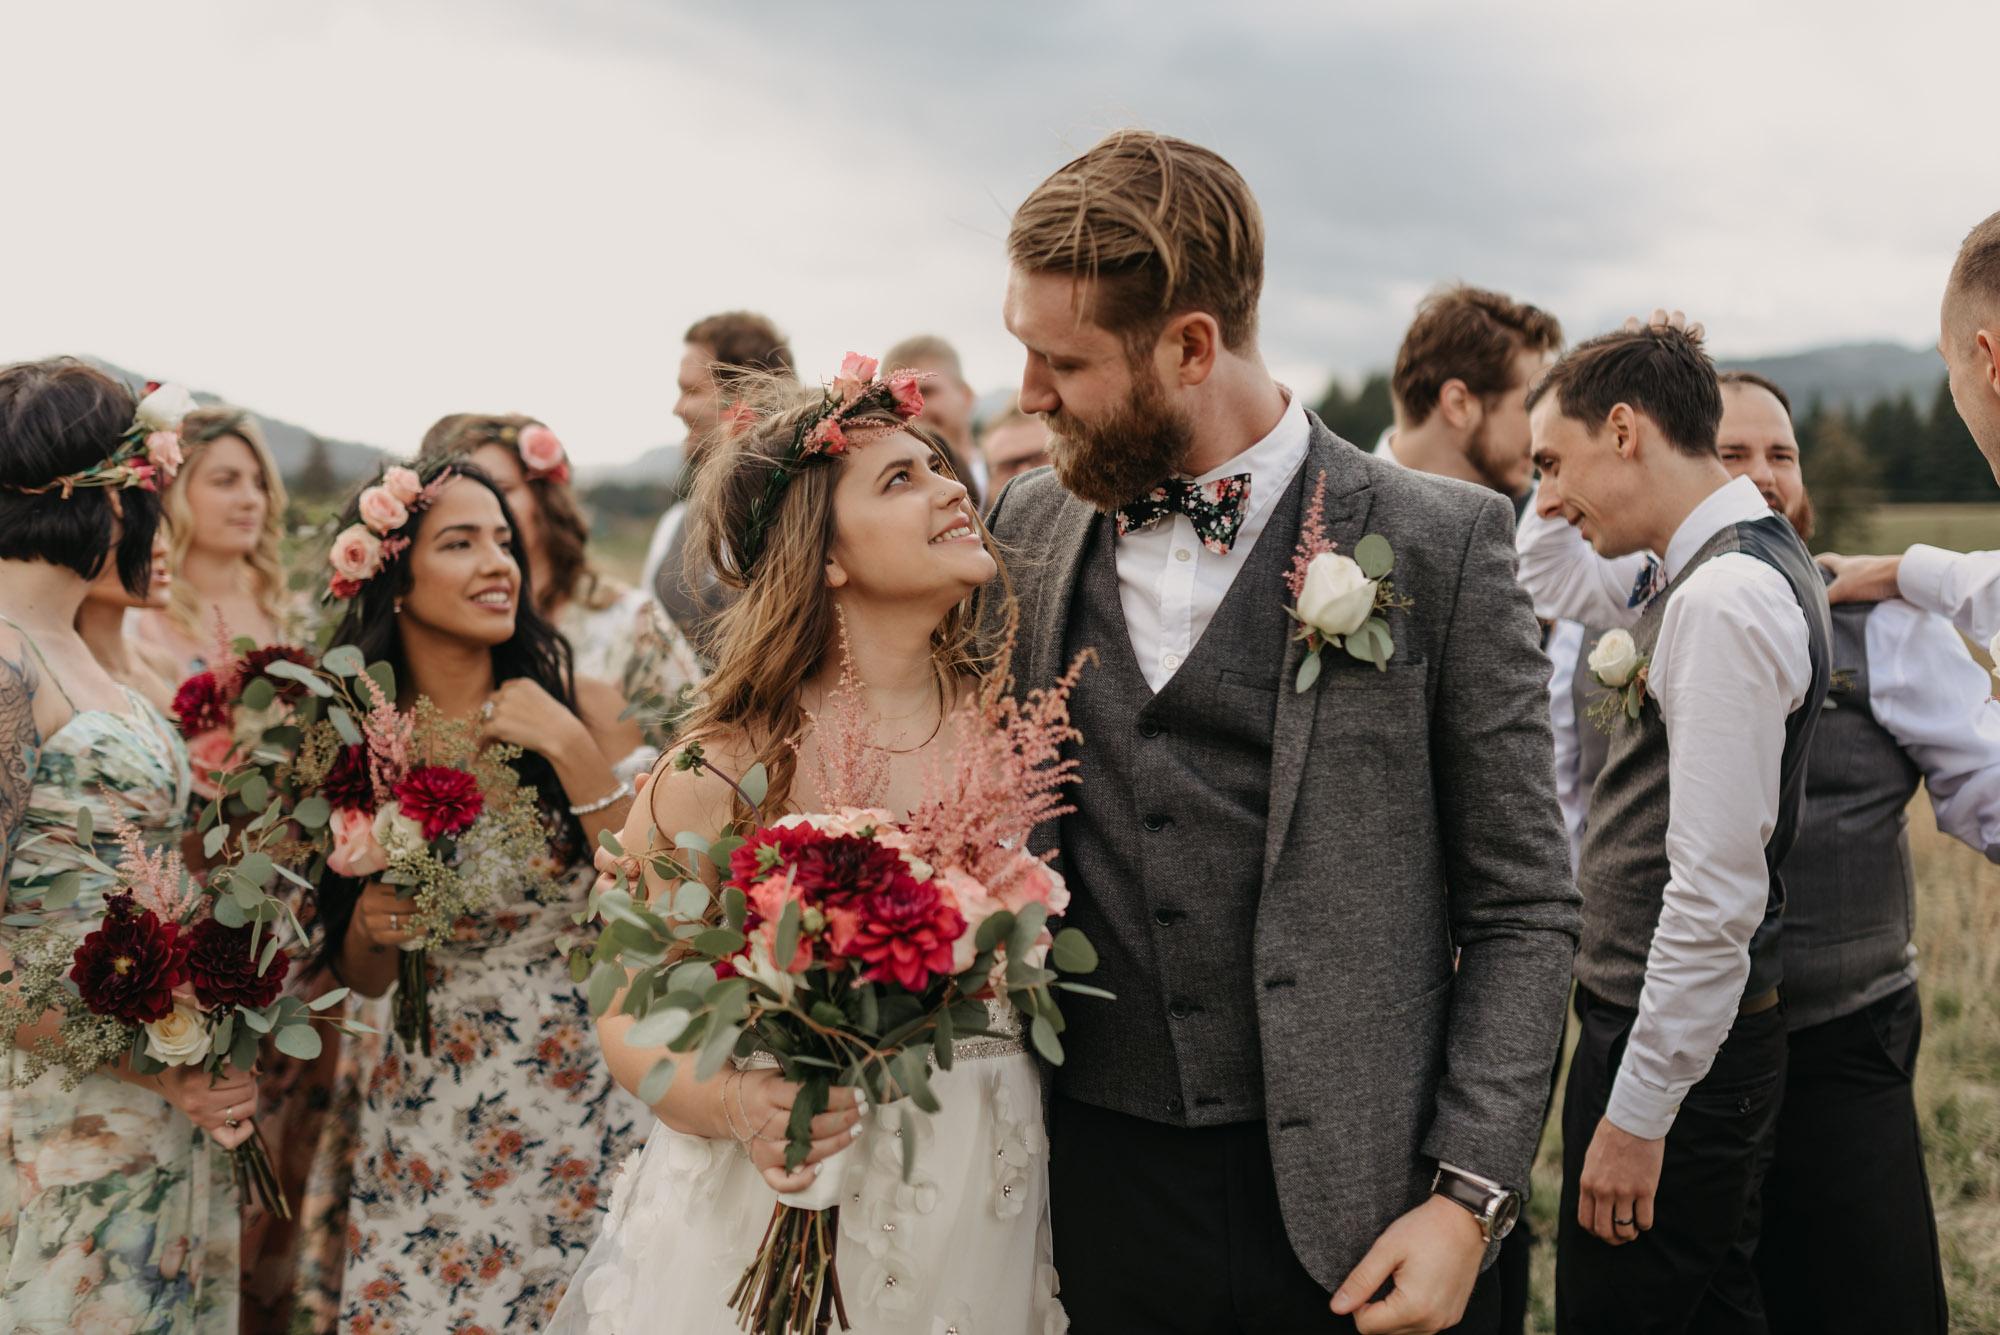 Bridal-Party-Free-People-Flower-Dresses-Washington-Wedding-8676.jpg